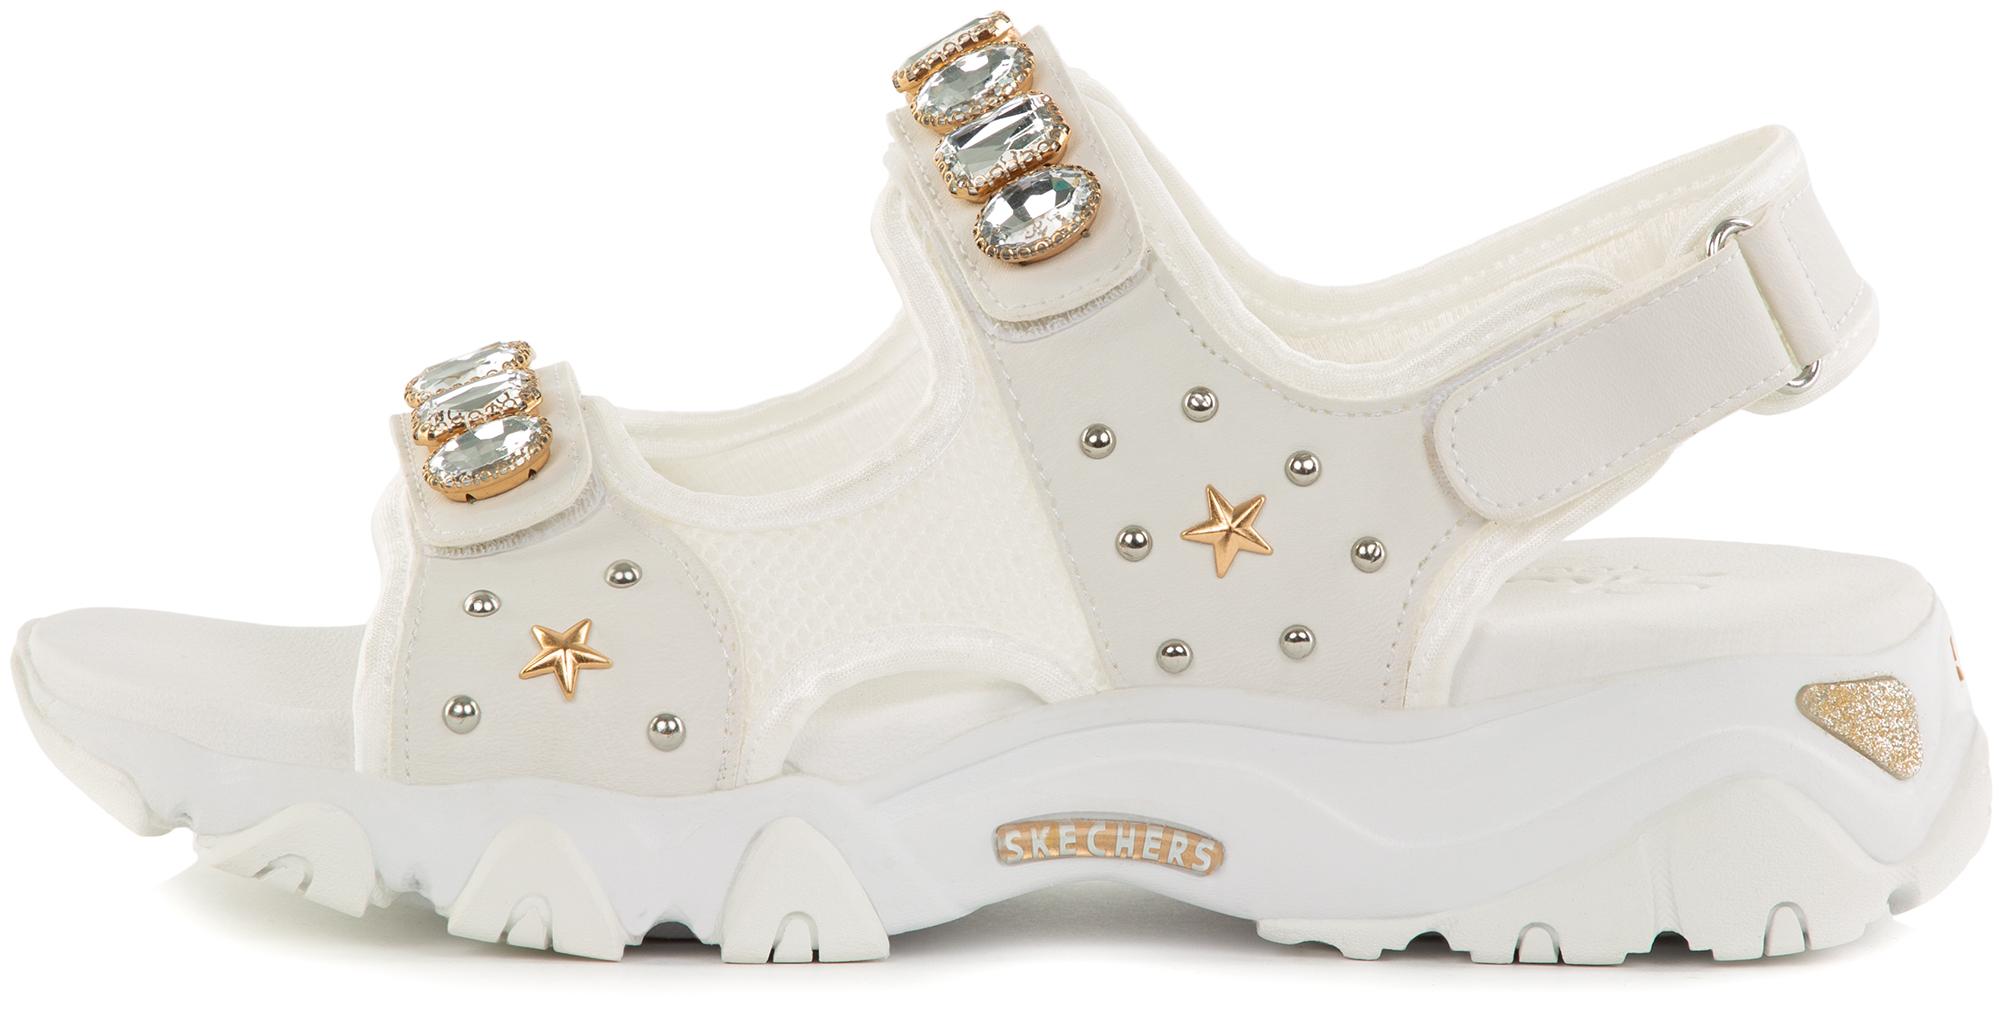 Сандалии женские Skechers D'Lites 2.0 Charm Box, размер 36